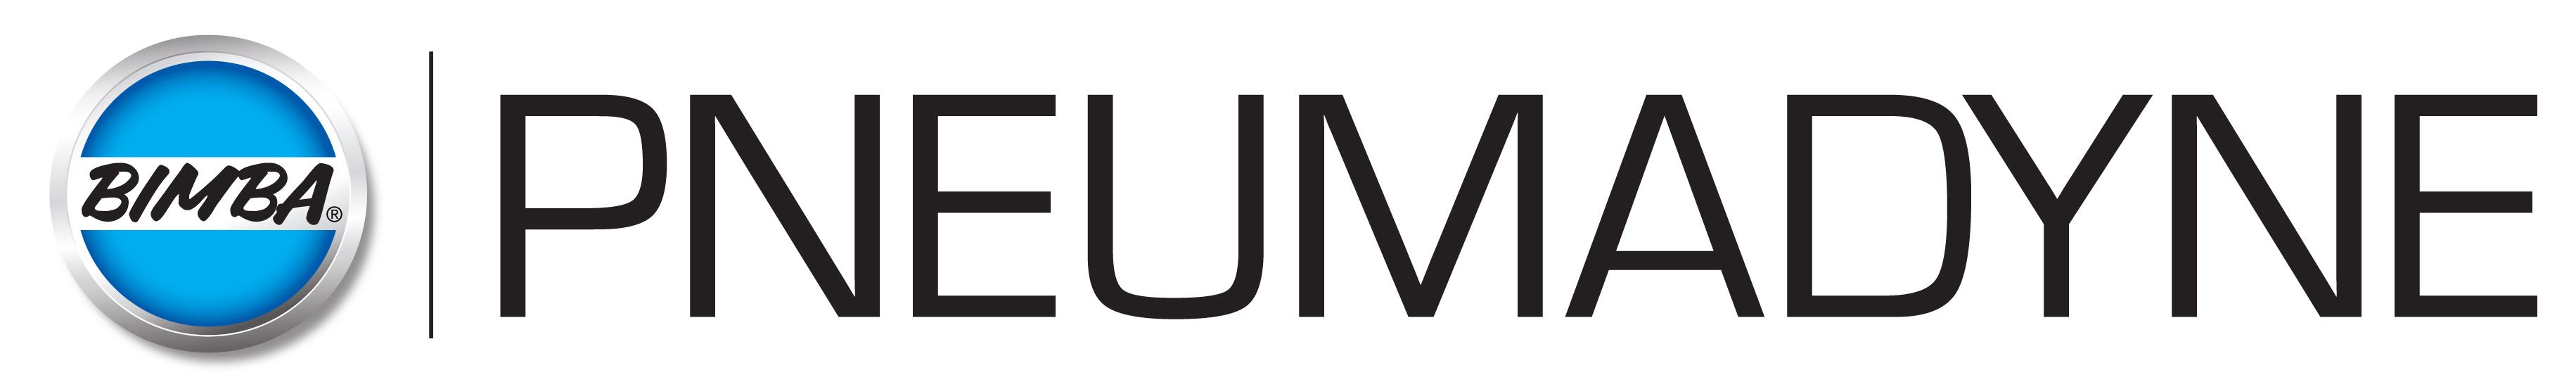 Pneumadyne_Logo